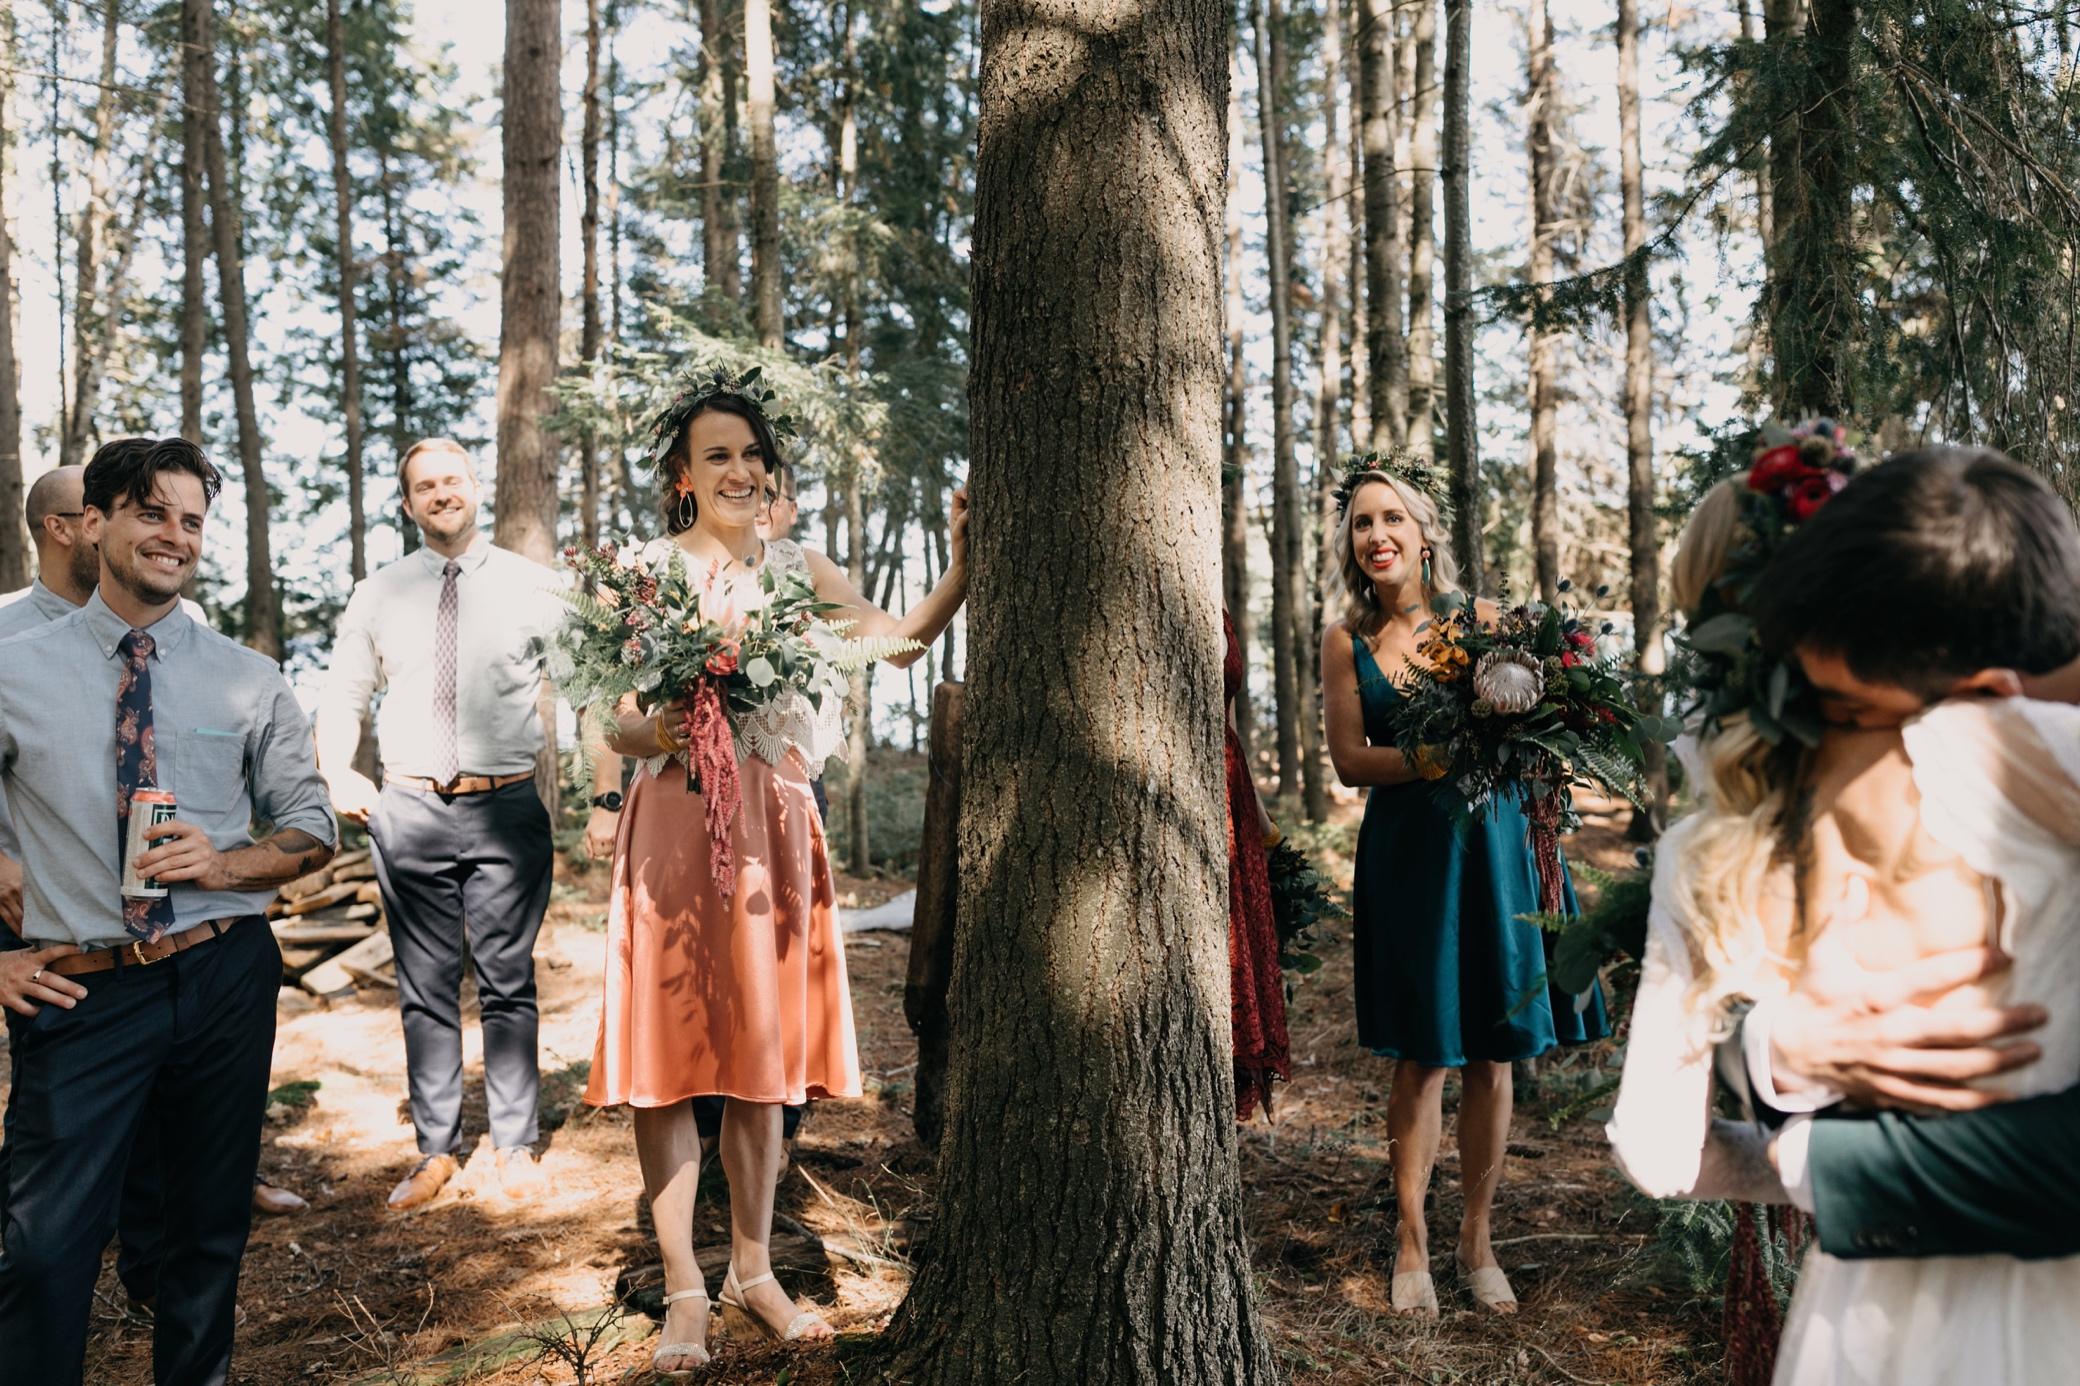 046_Huntsville Wedding  (163 of 689).jpg